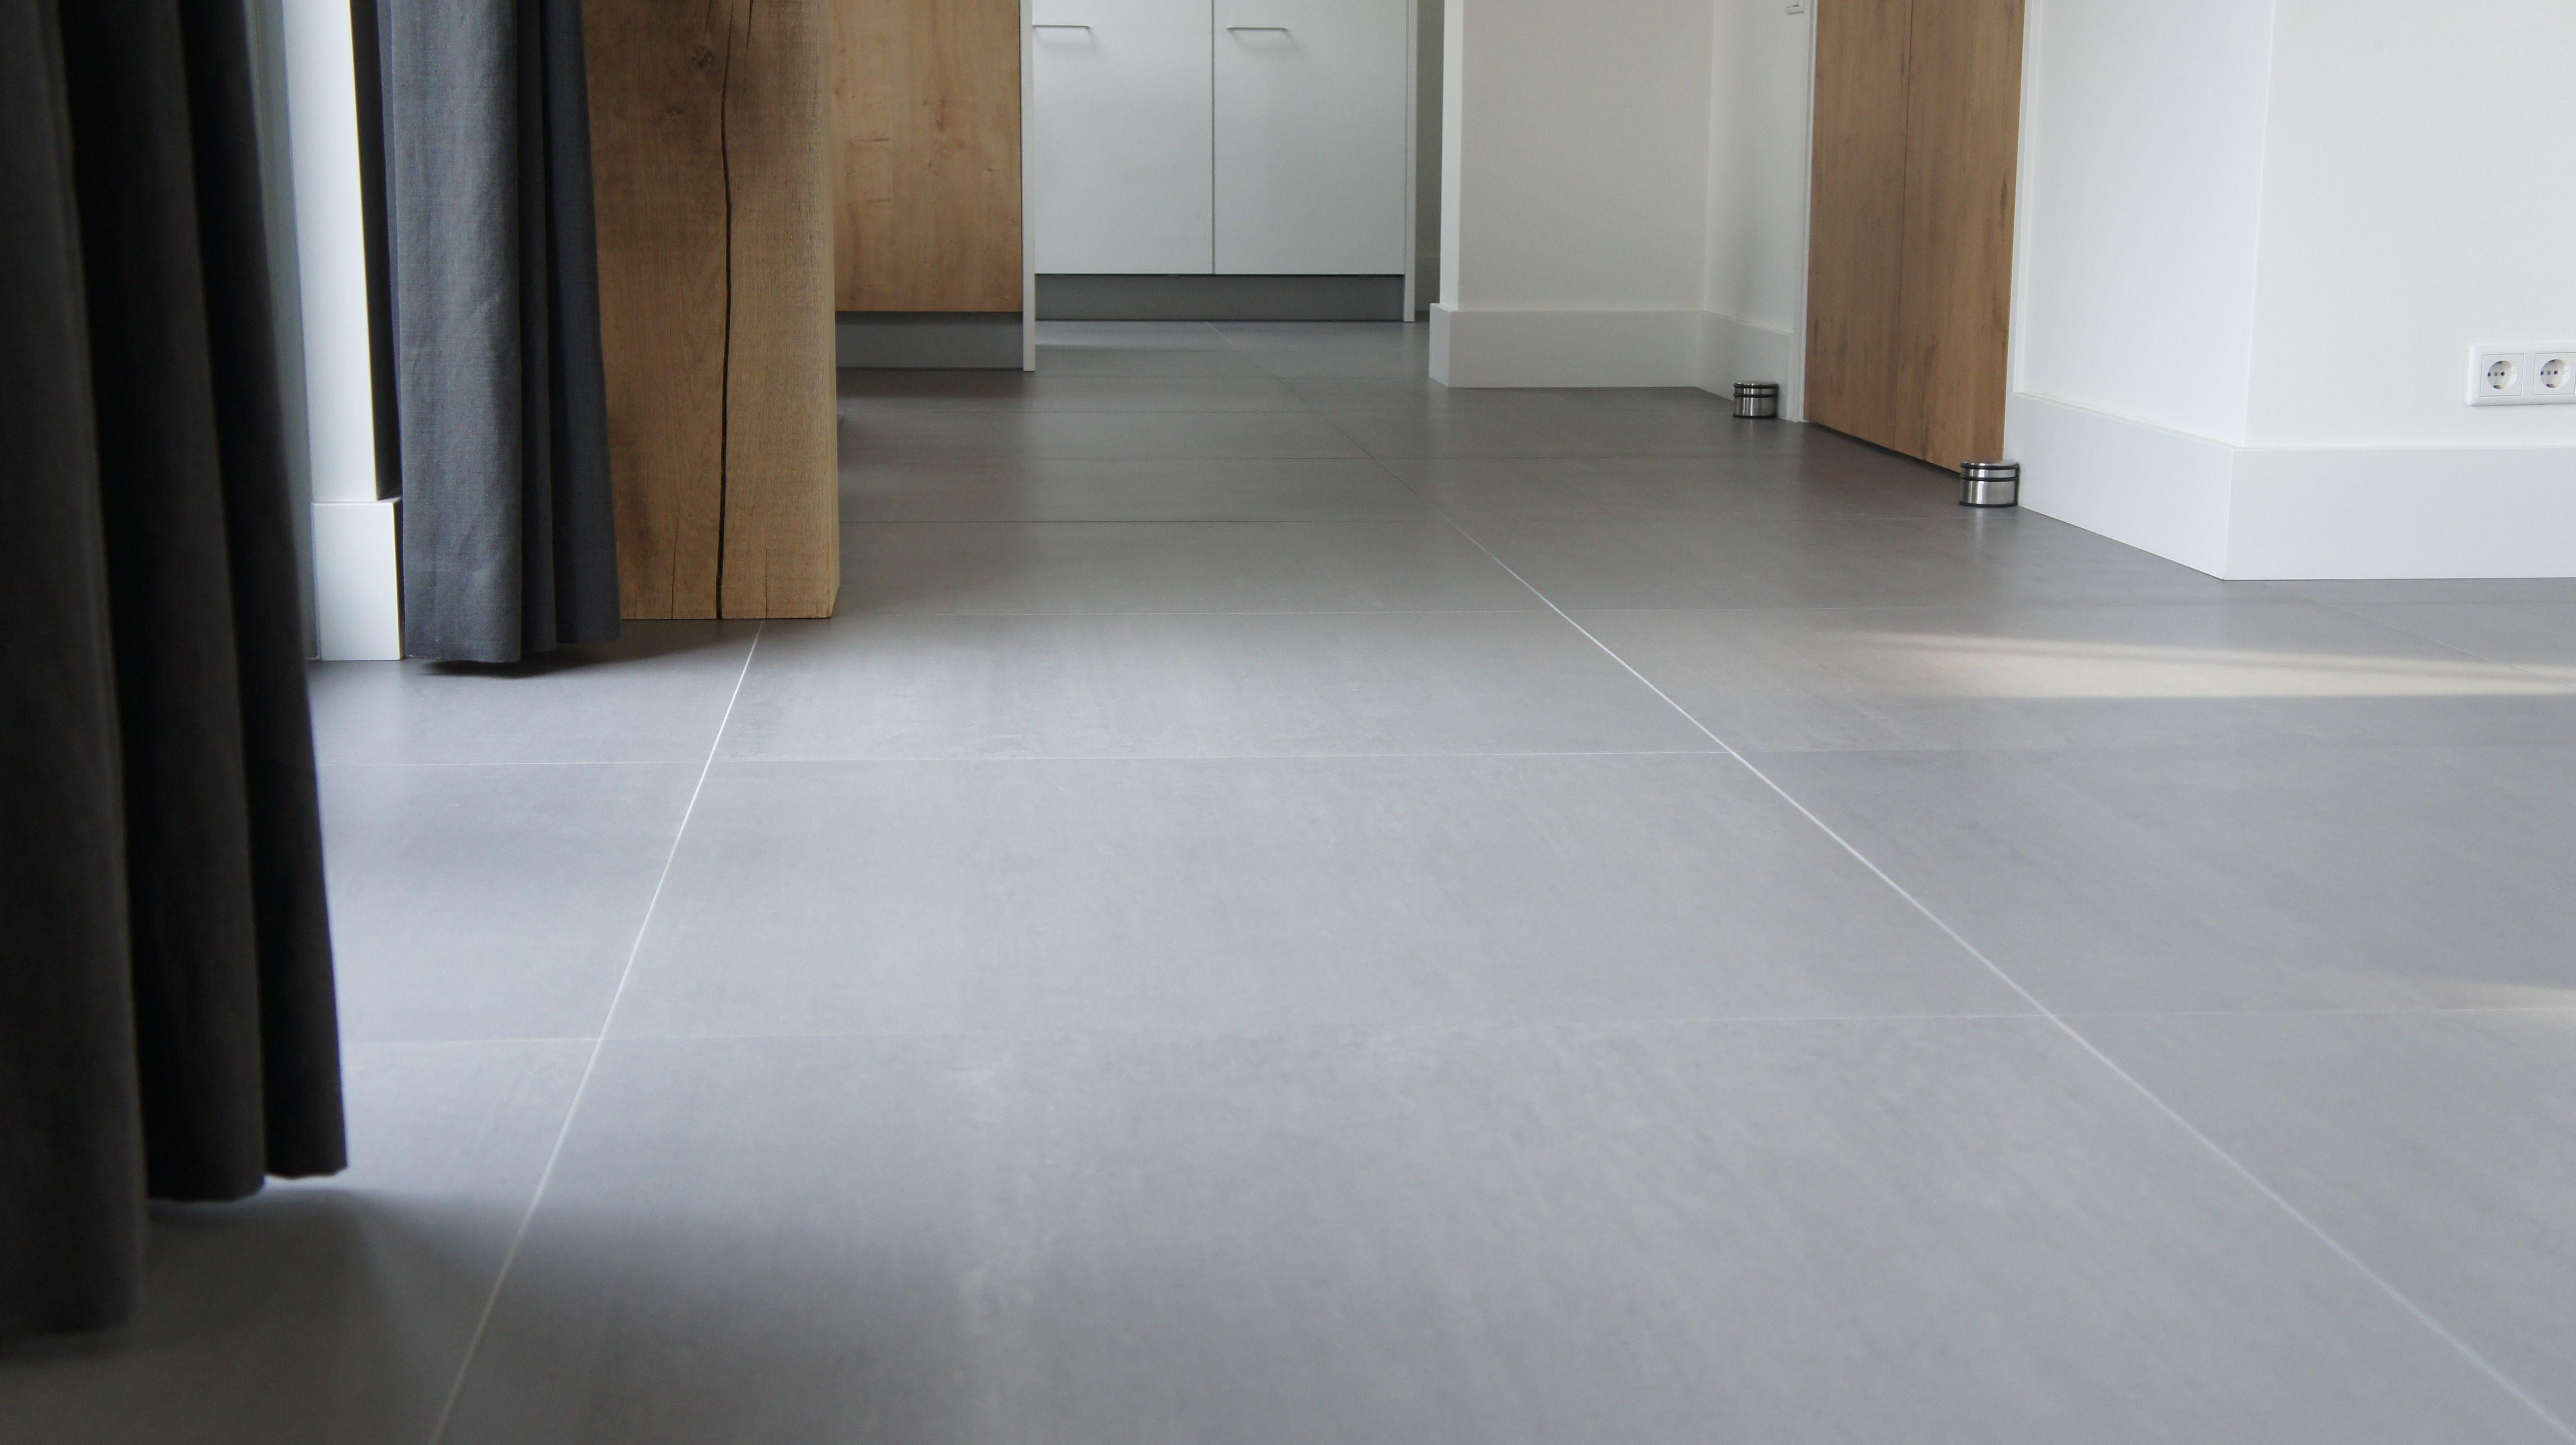 Grijze Tegels Woonkamer : Vloertegels woonkamer grijs grijze tegels woonkamer